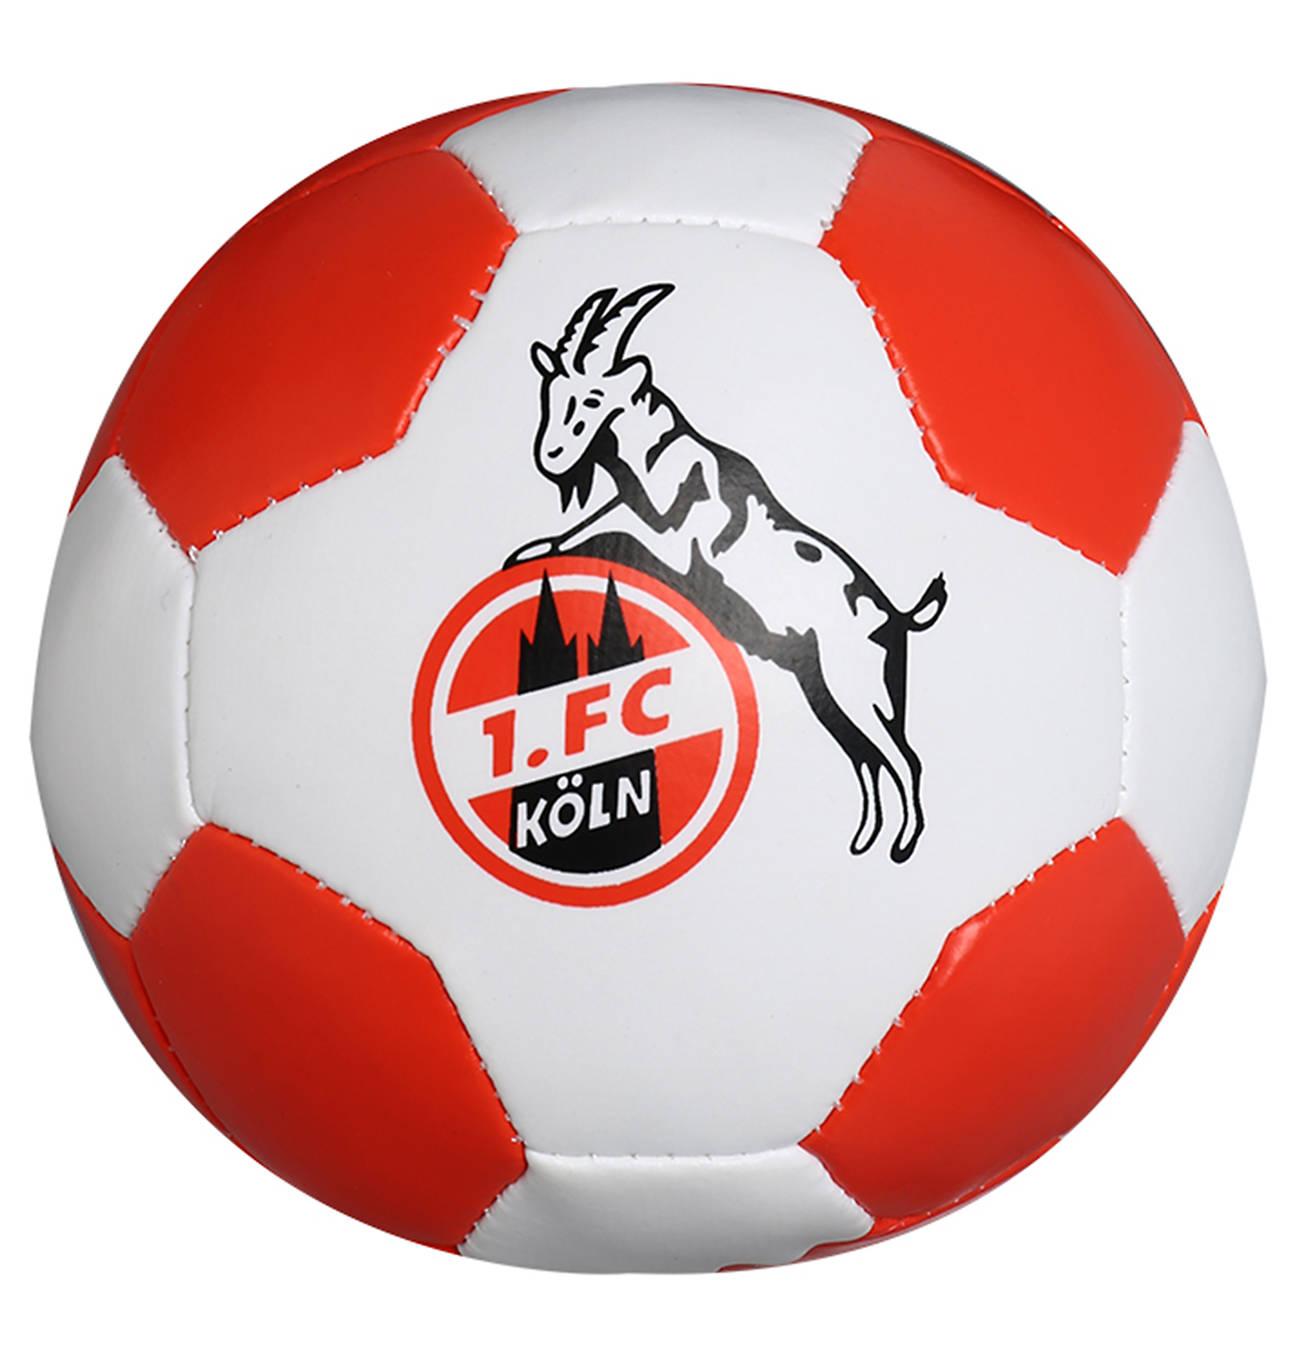 Pin auf 1.FC Köln